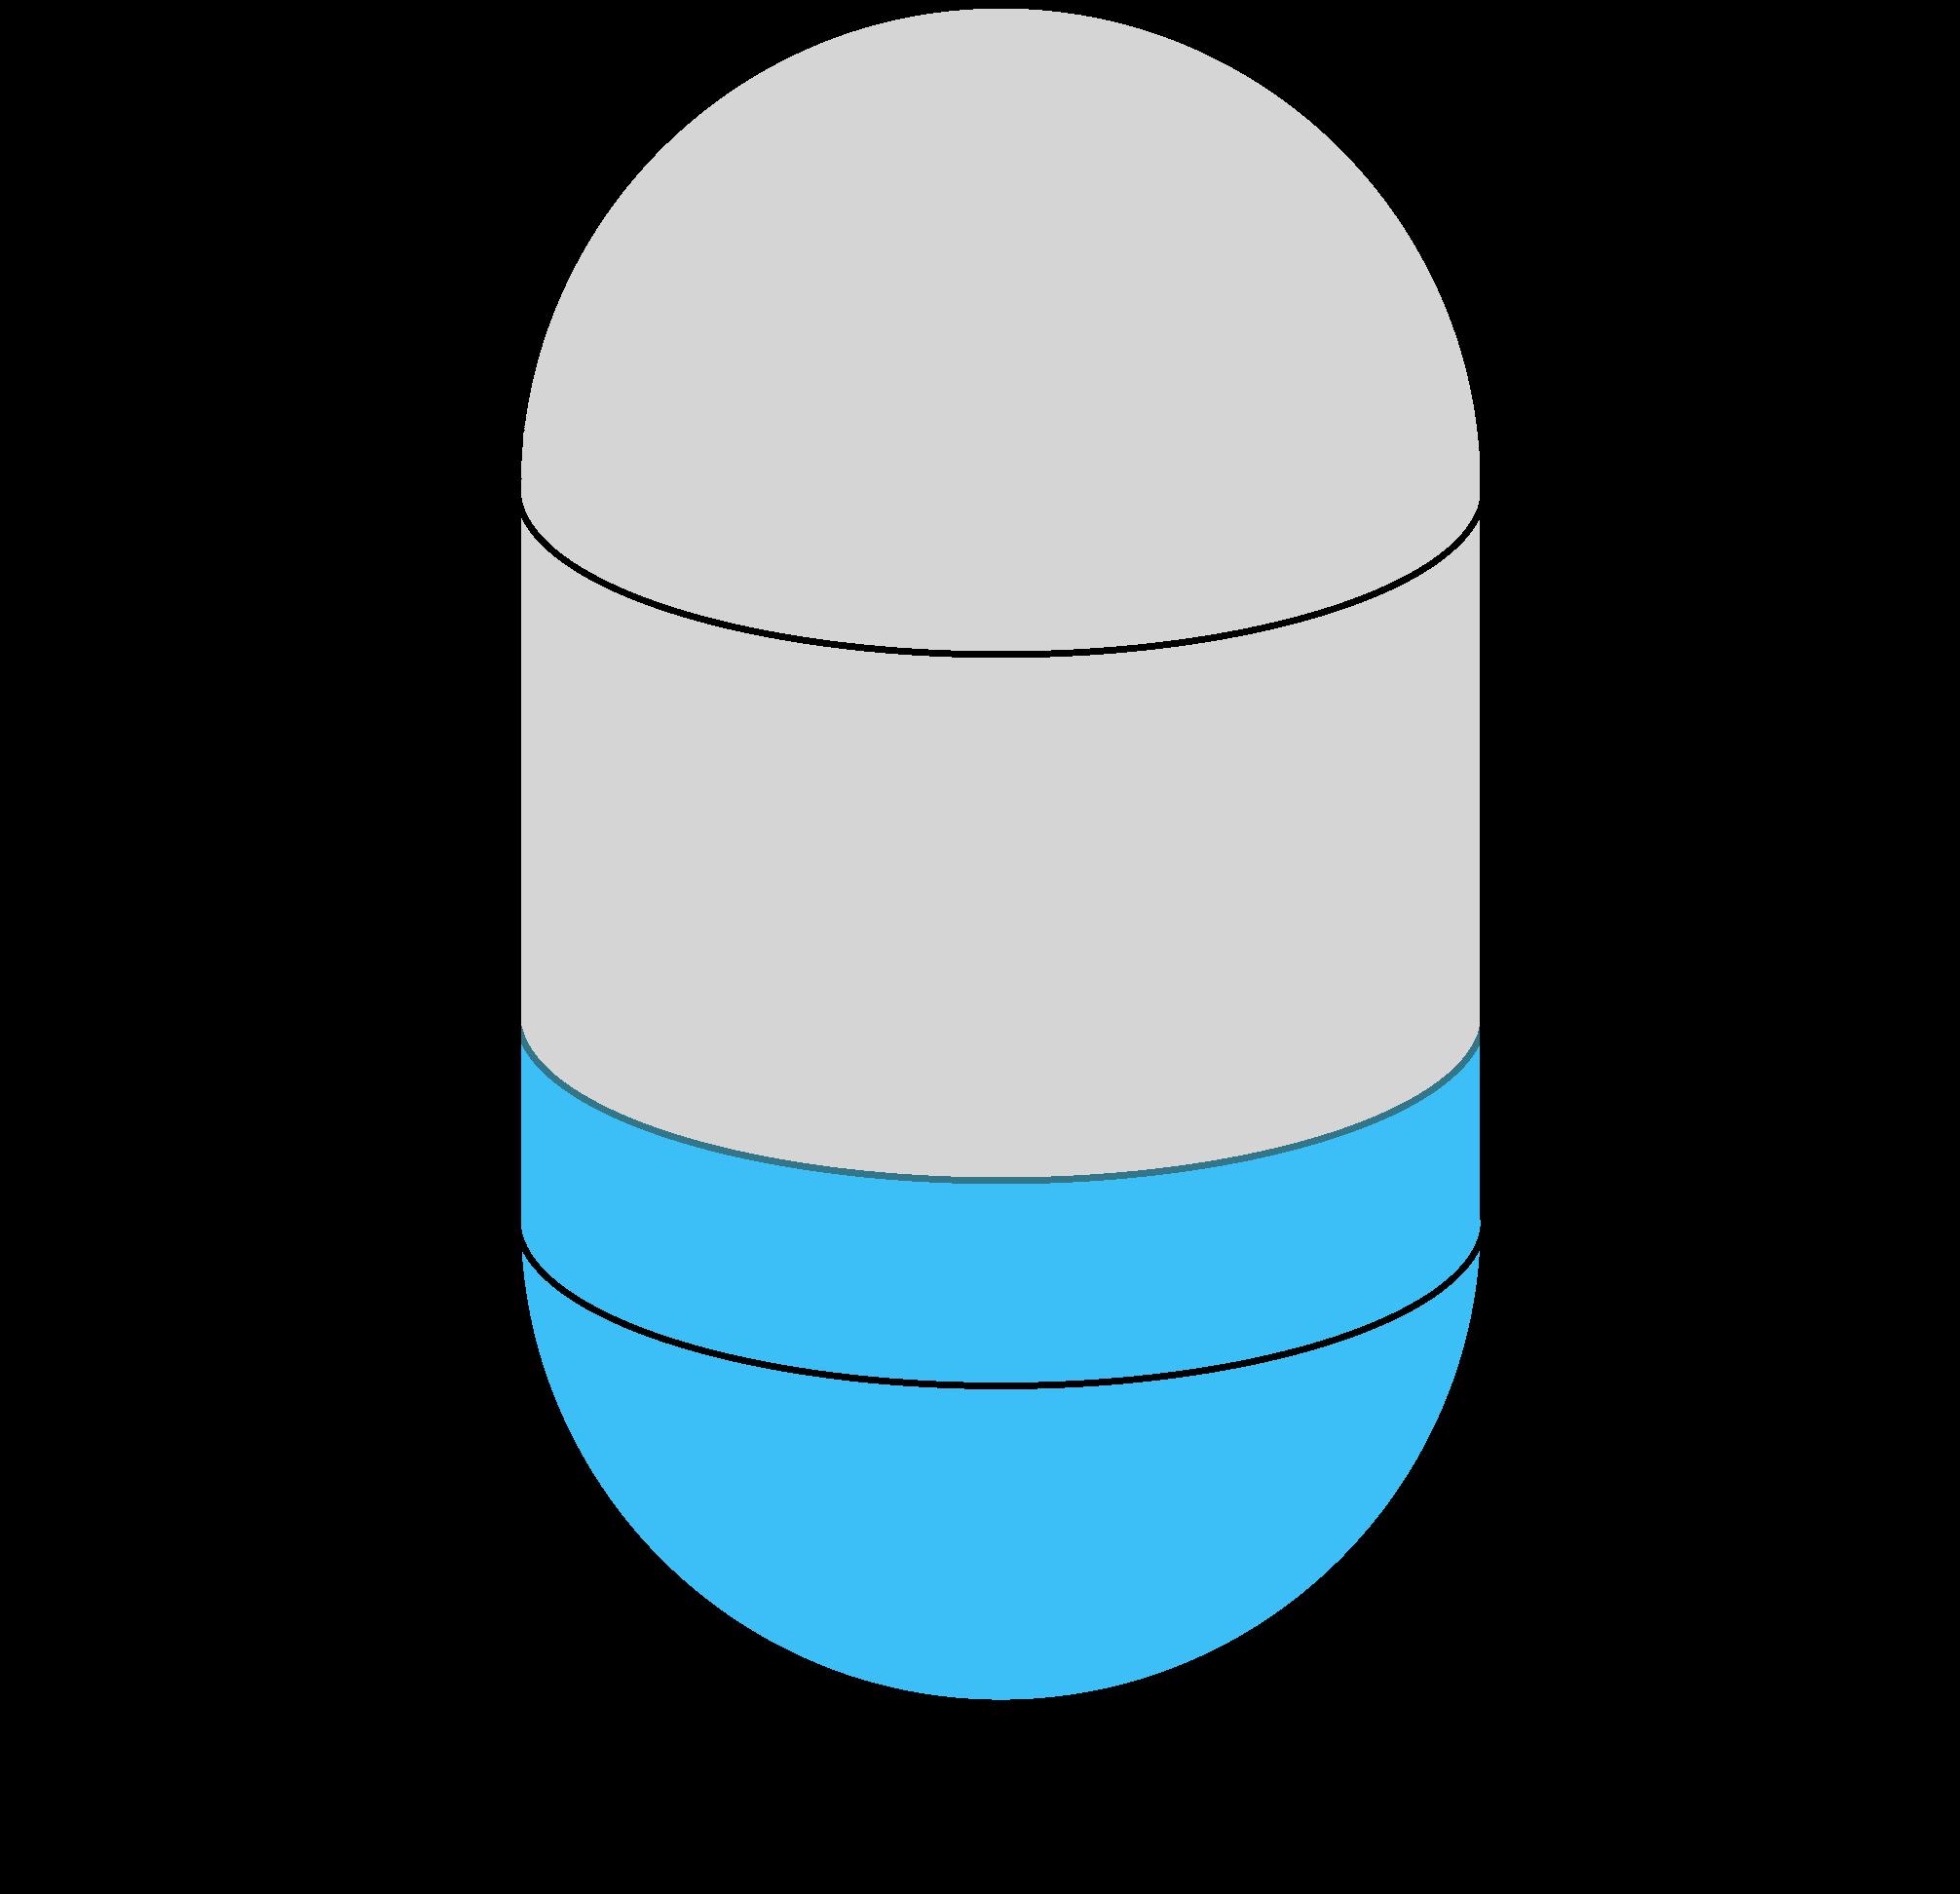 vertical capsule tank diagram showing side length, diameter, and fill depth dimensions